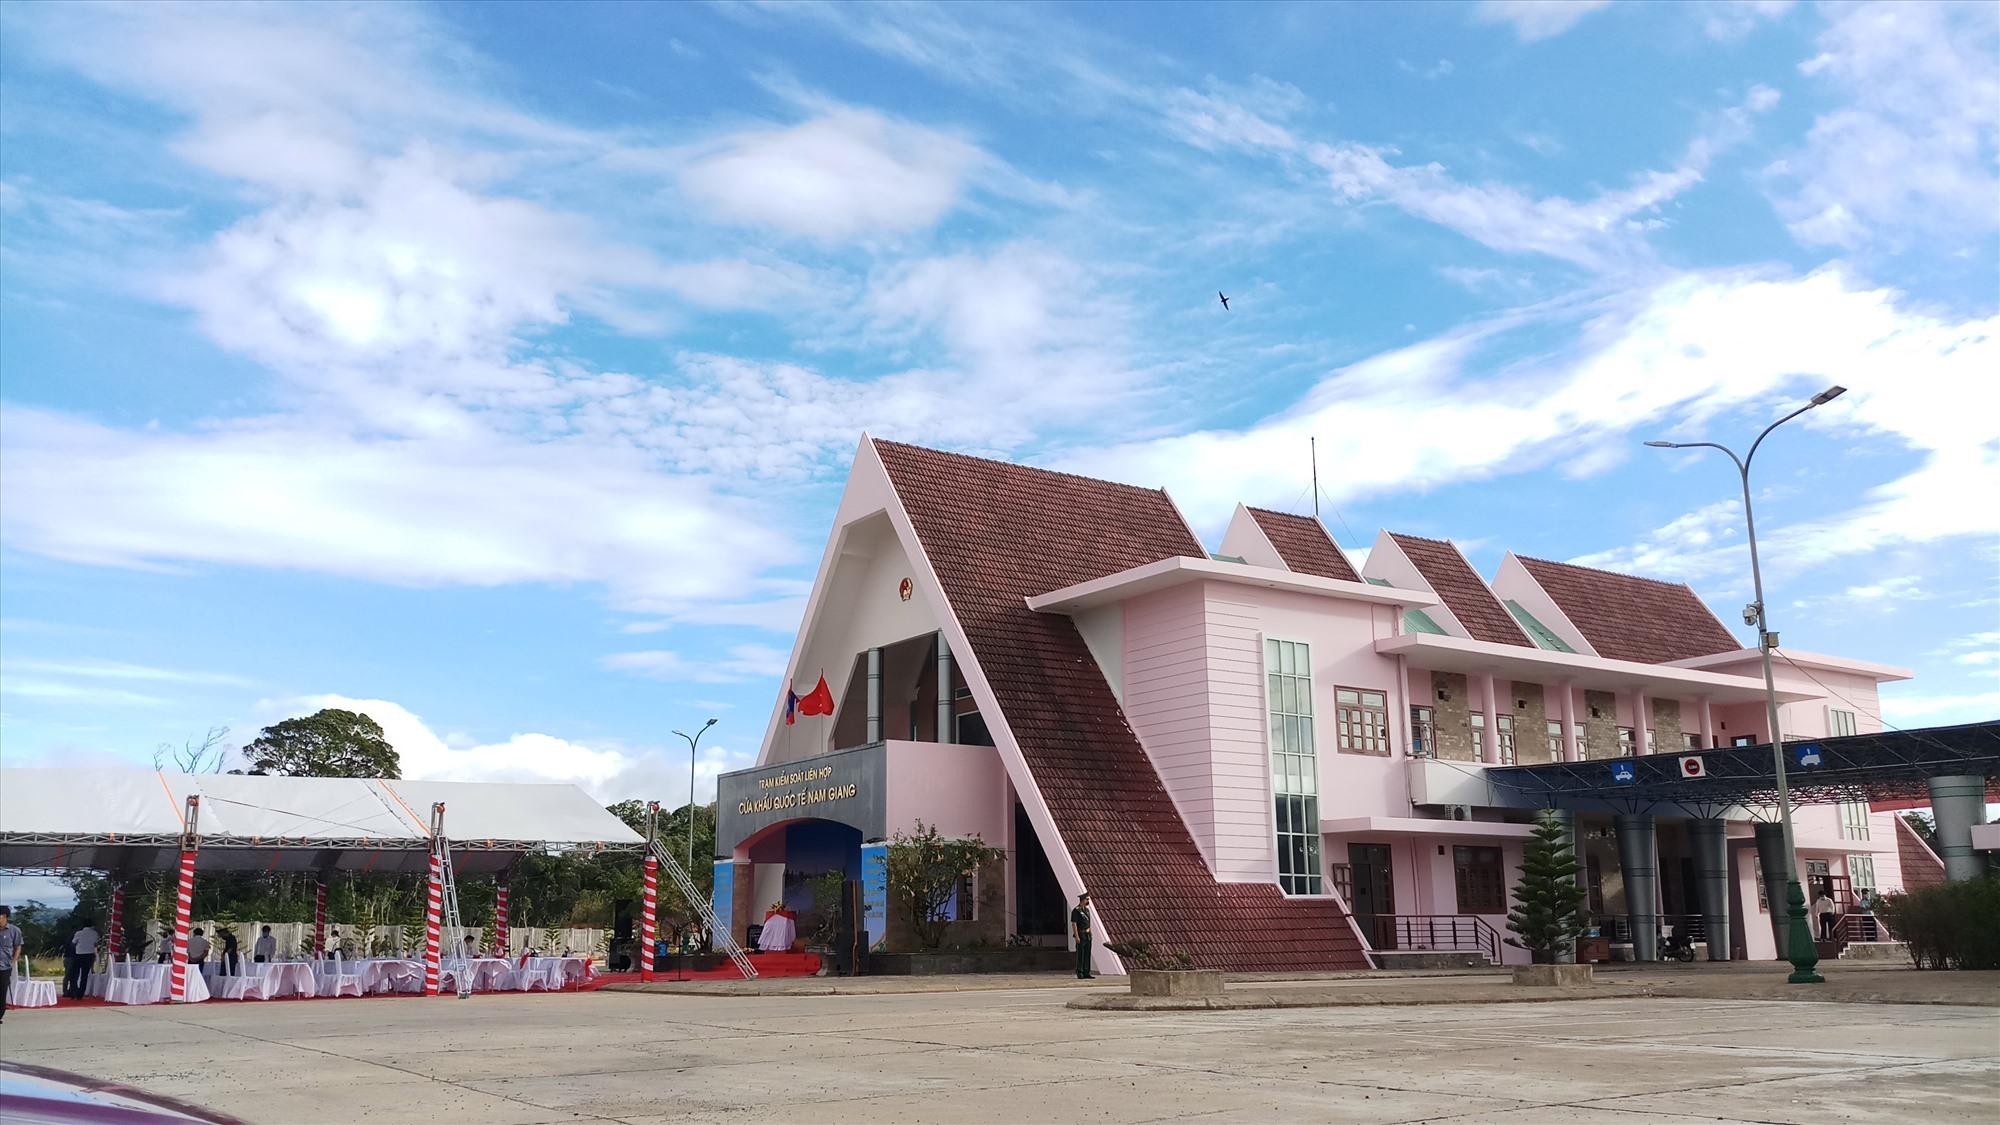 Nam Giang – Dak Ta-Ook border gate between Quang Nam province and Sekong province (Laos)